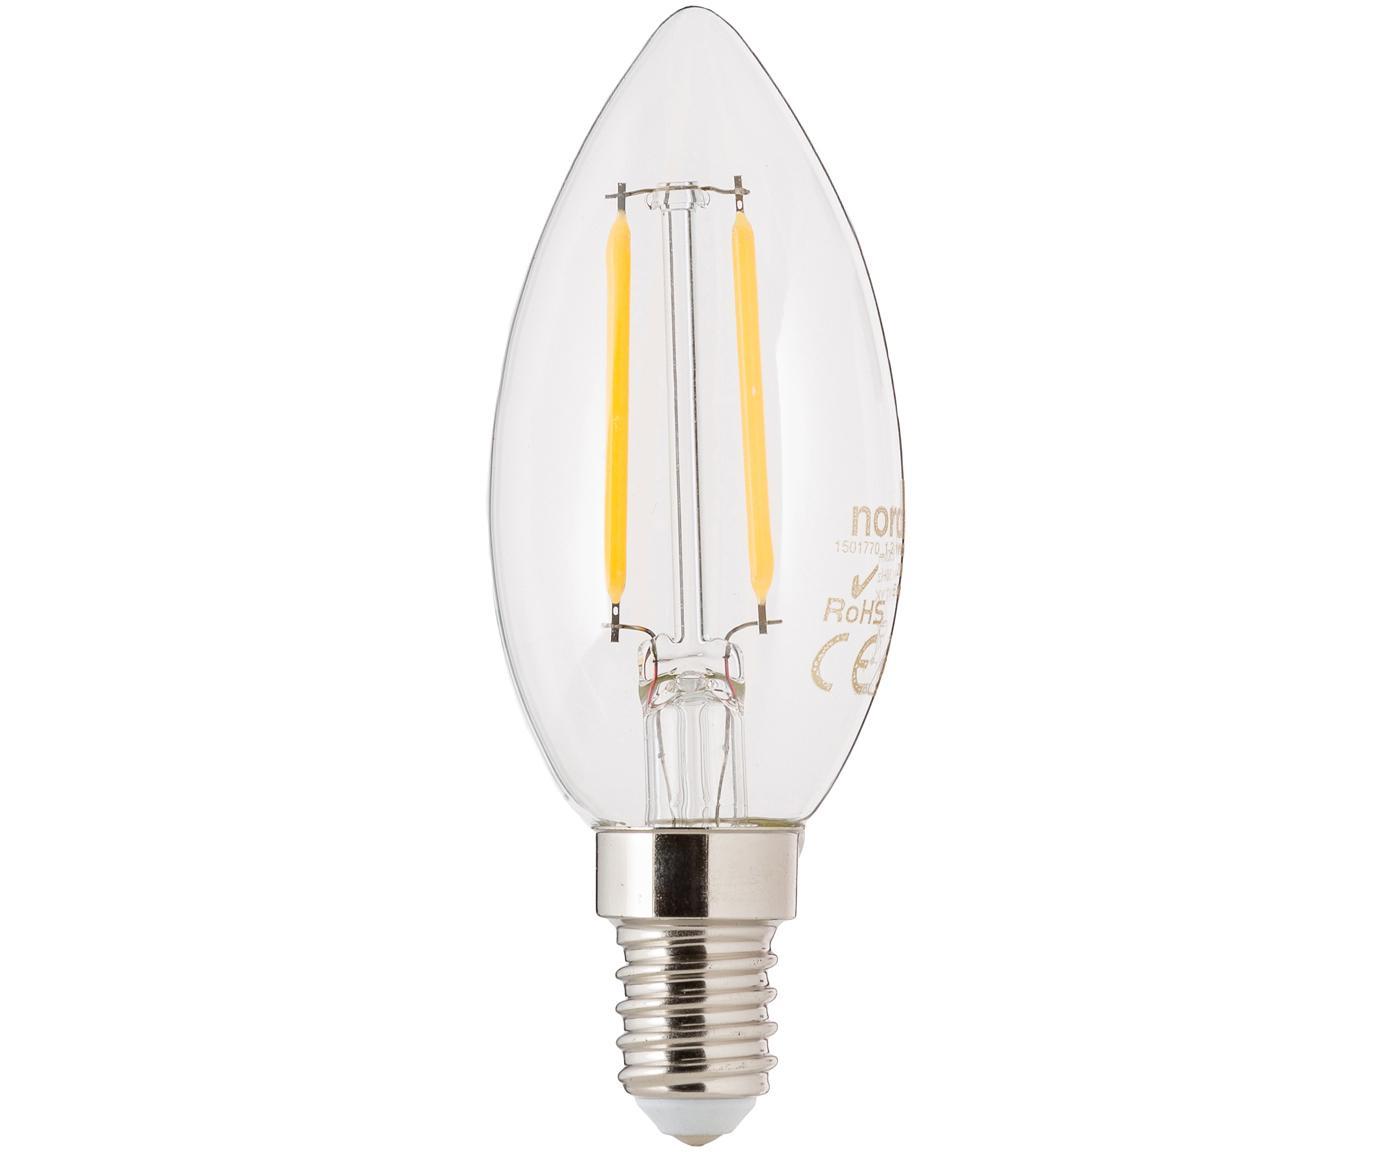 LED Leuchtmittel Vel (E14/2.5W), 5 Stück, Leuchtmittelschirm: Glas, Leuchtmittelfassung: Aluminium, Transparent, Ø 4 x H 10 cm